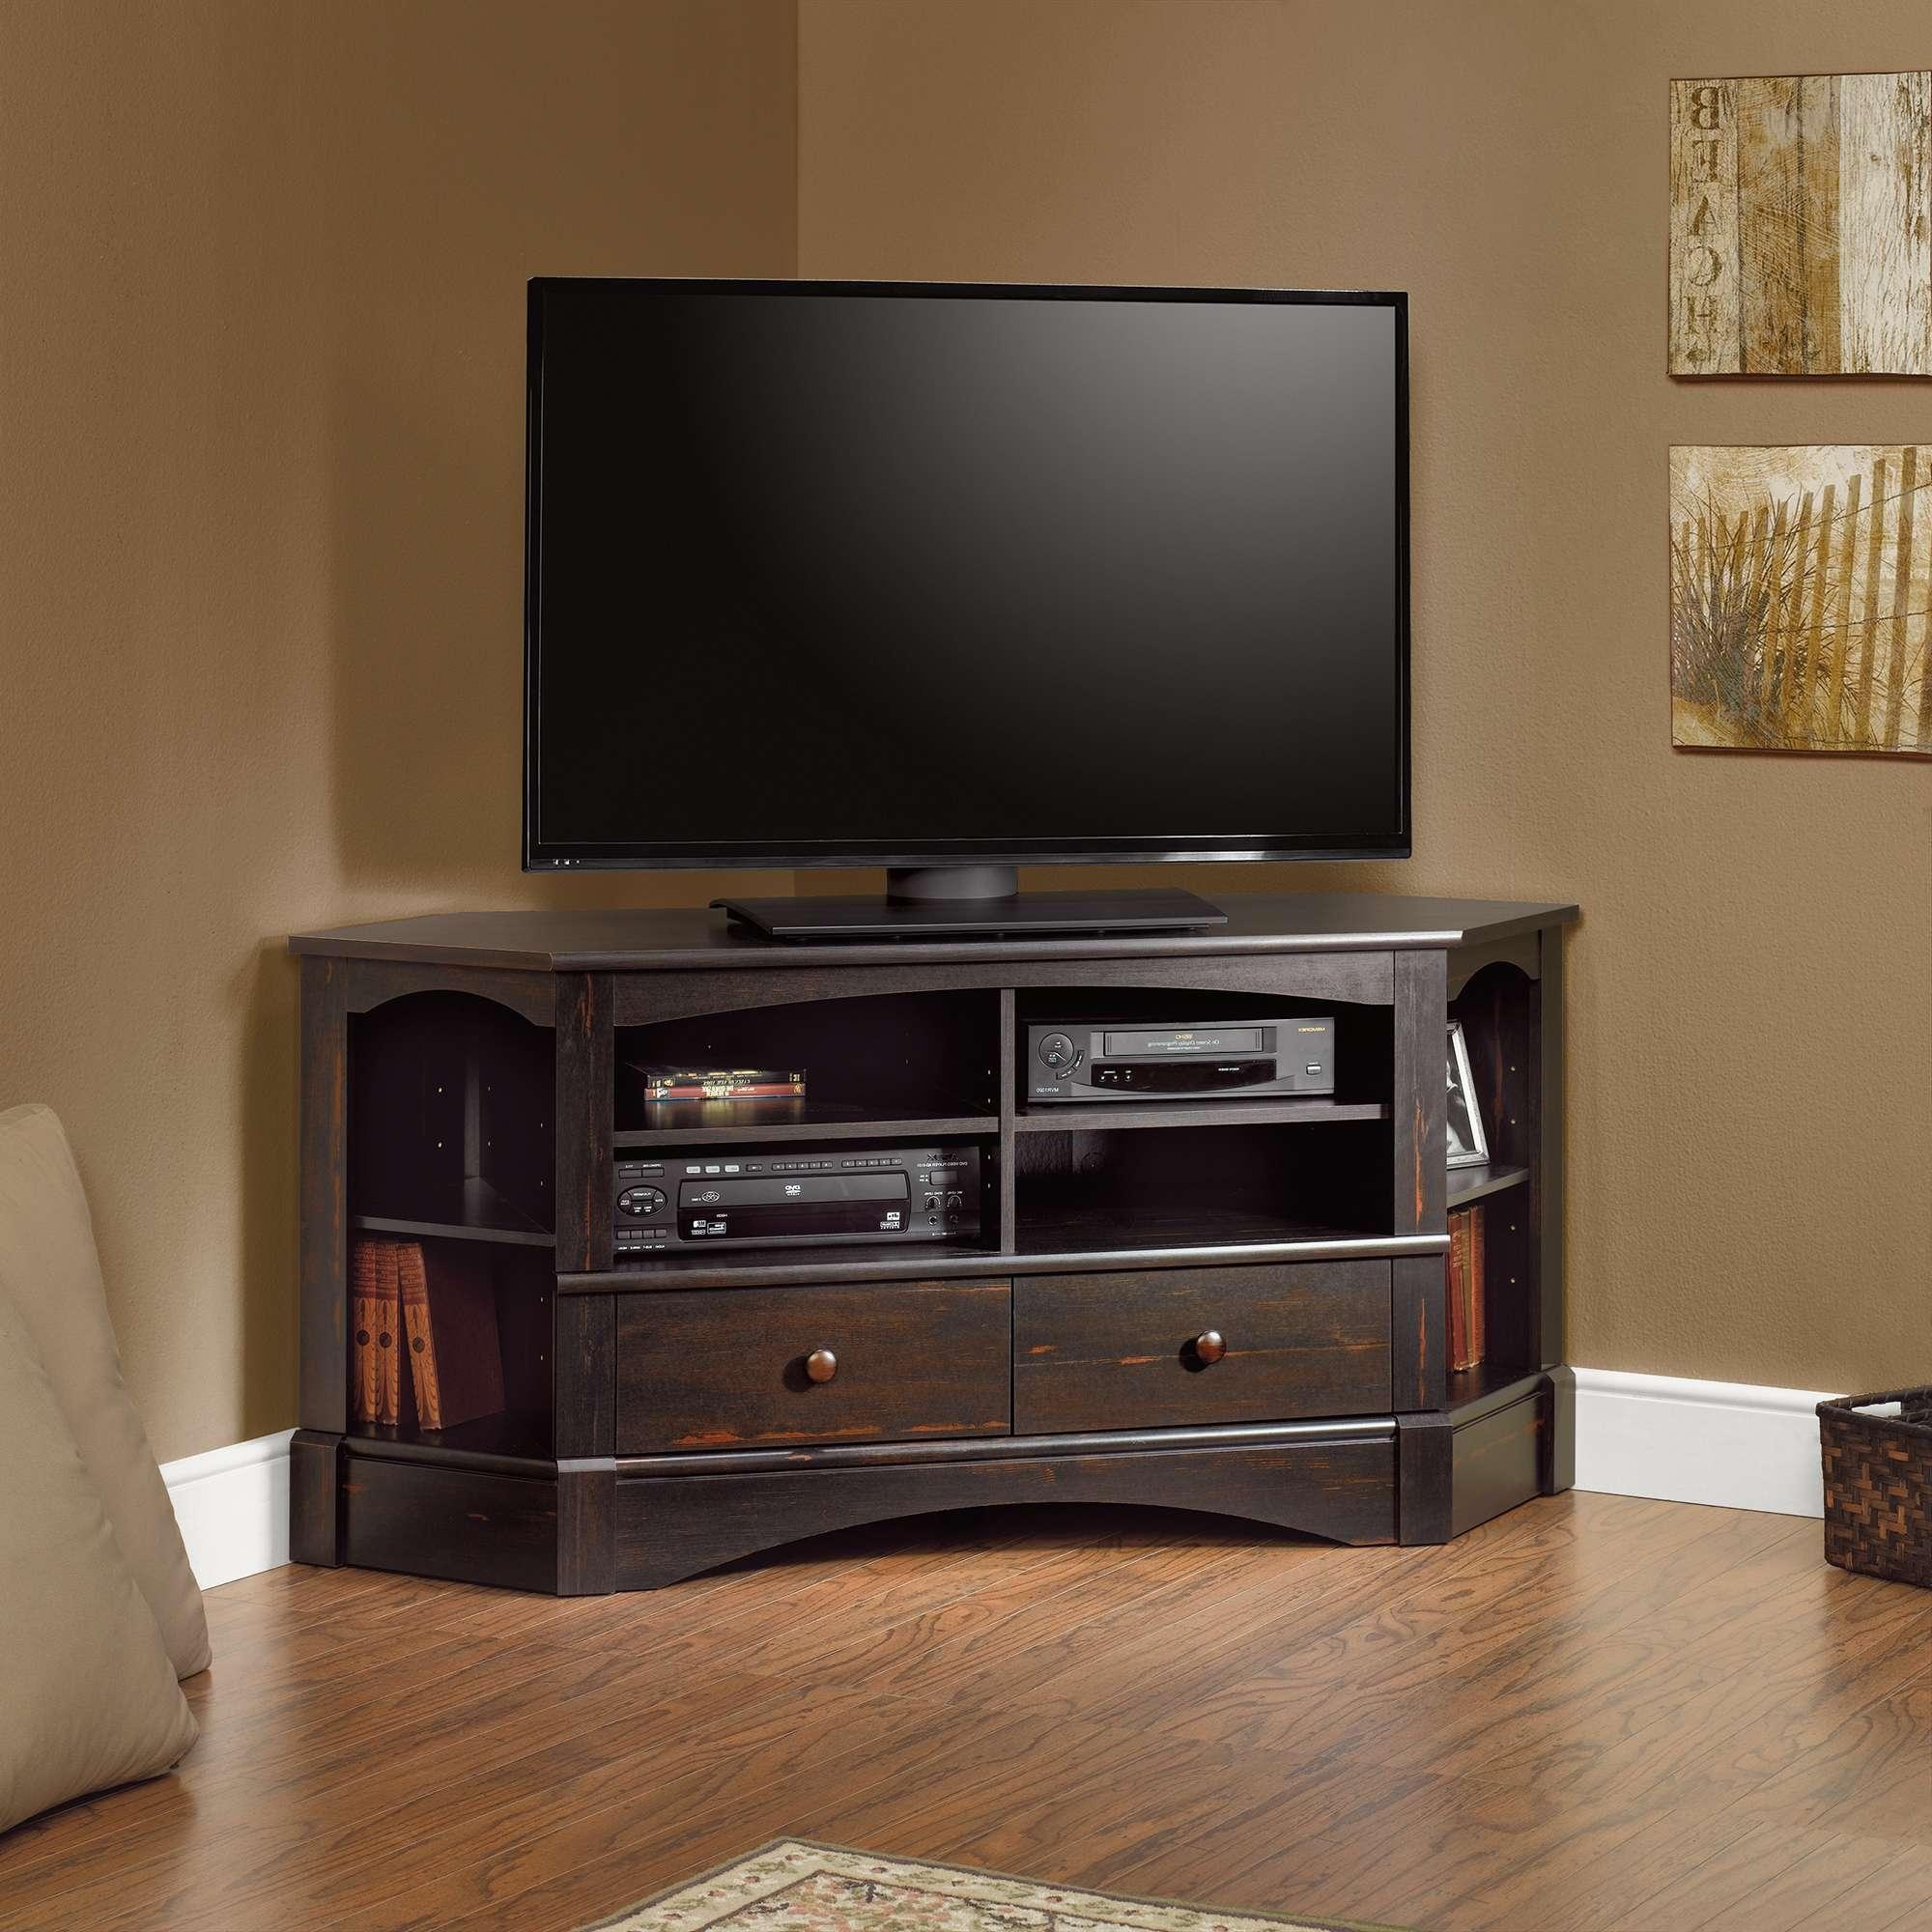 Harbor View | Corner Entertainment Credenza | 402902 | Sauder Regarding Walnut Corner Tv Stands (View 7 of 15)